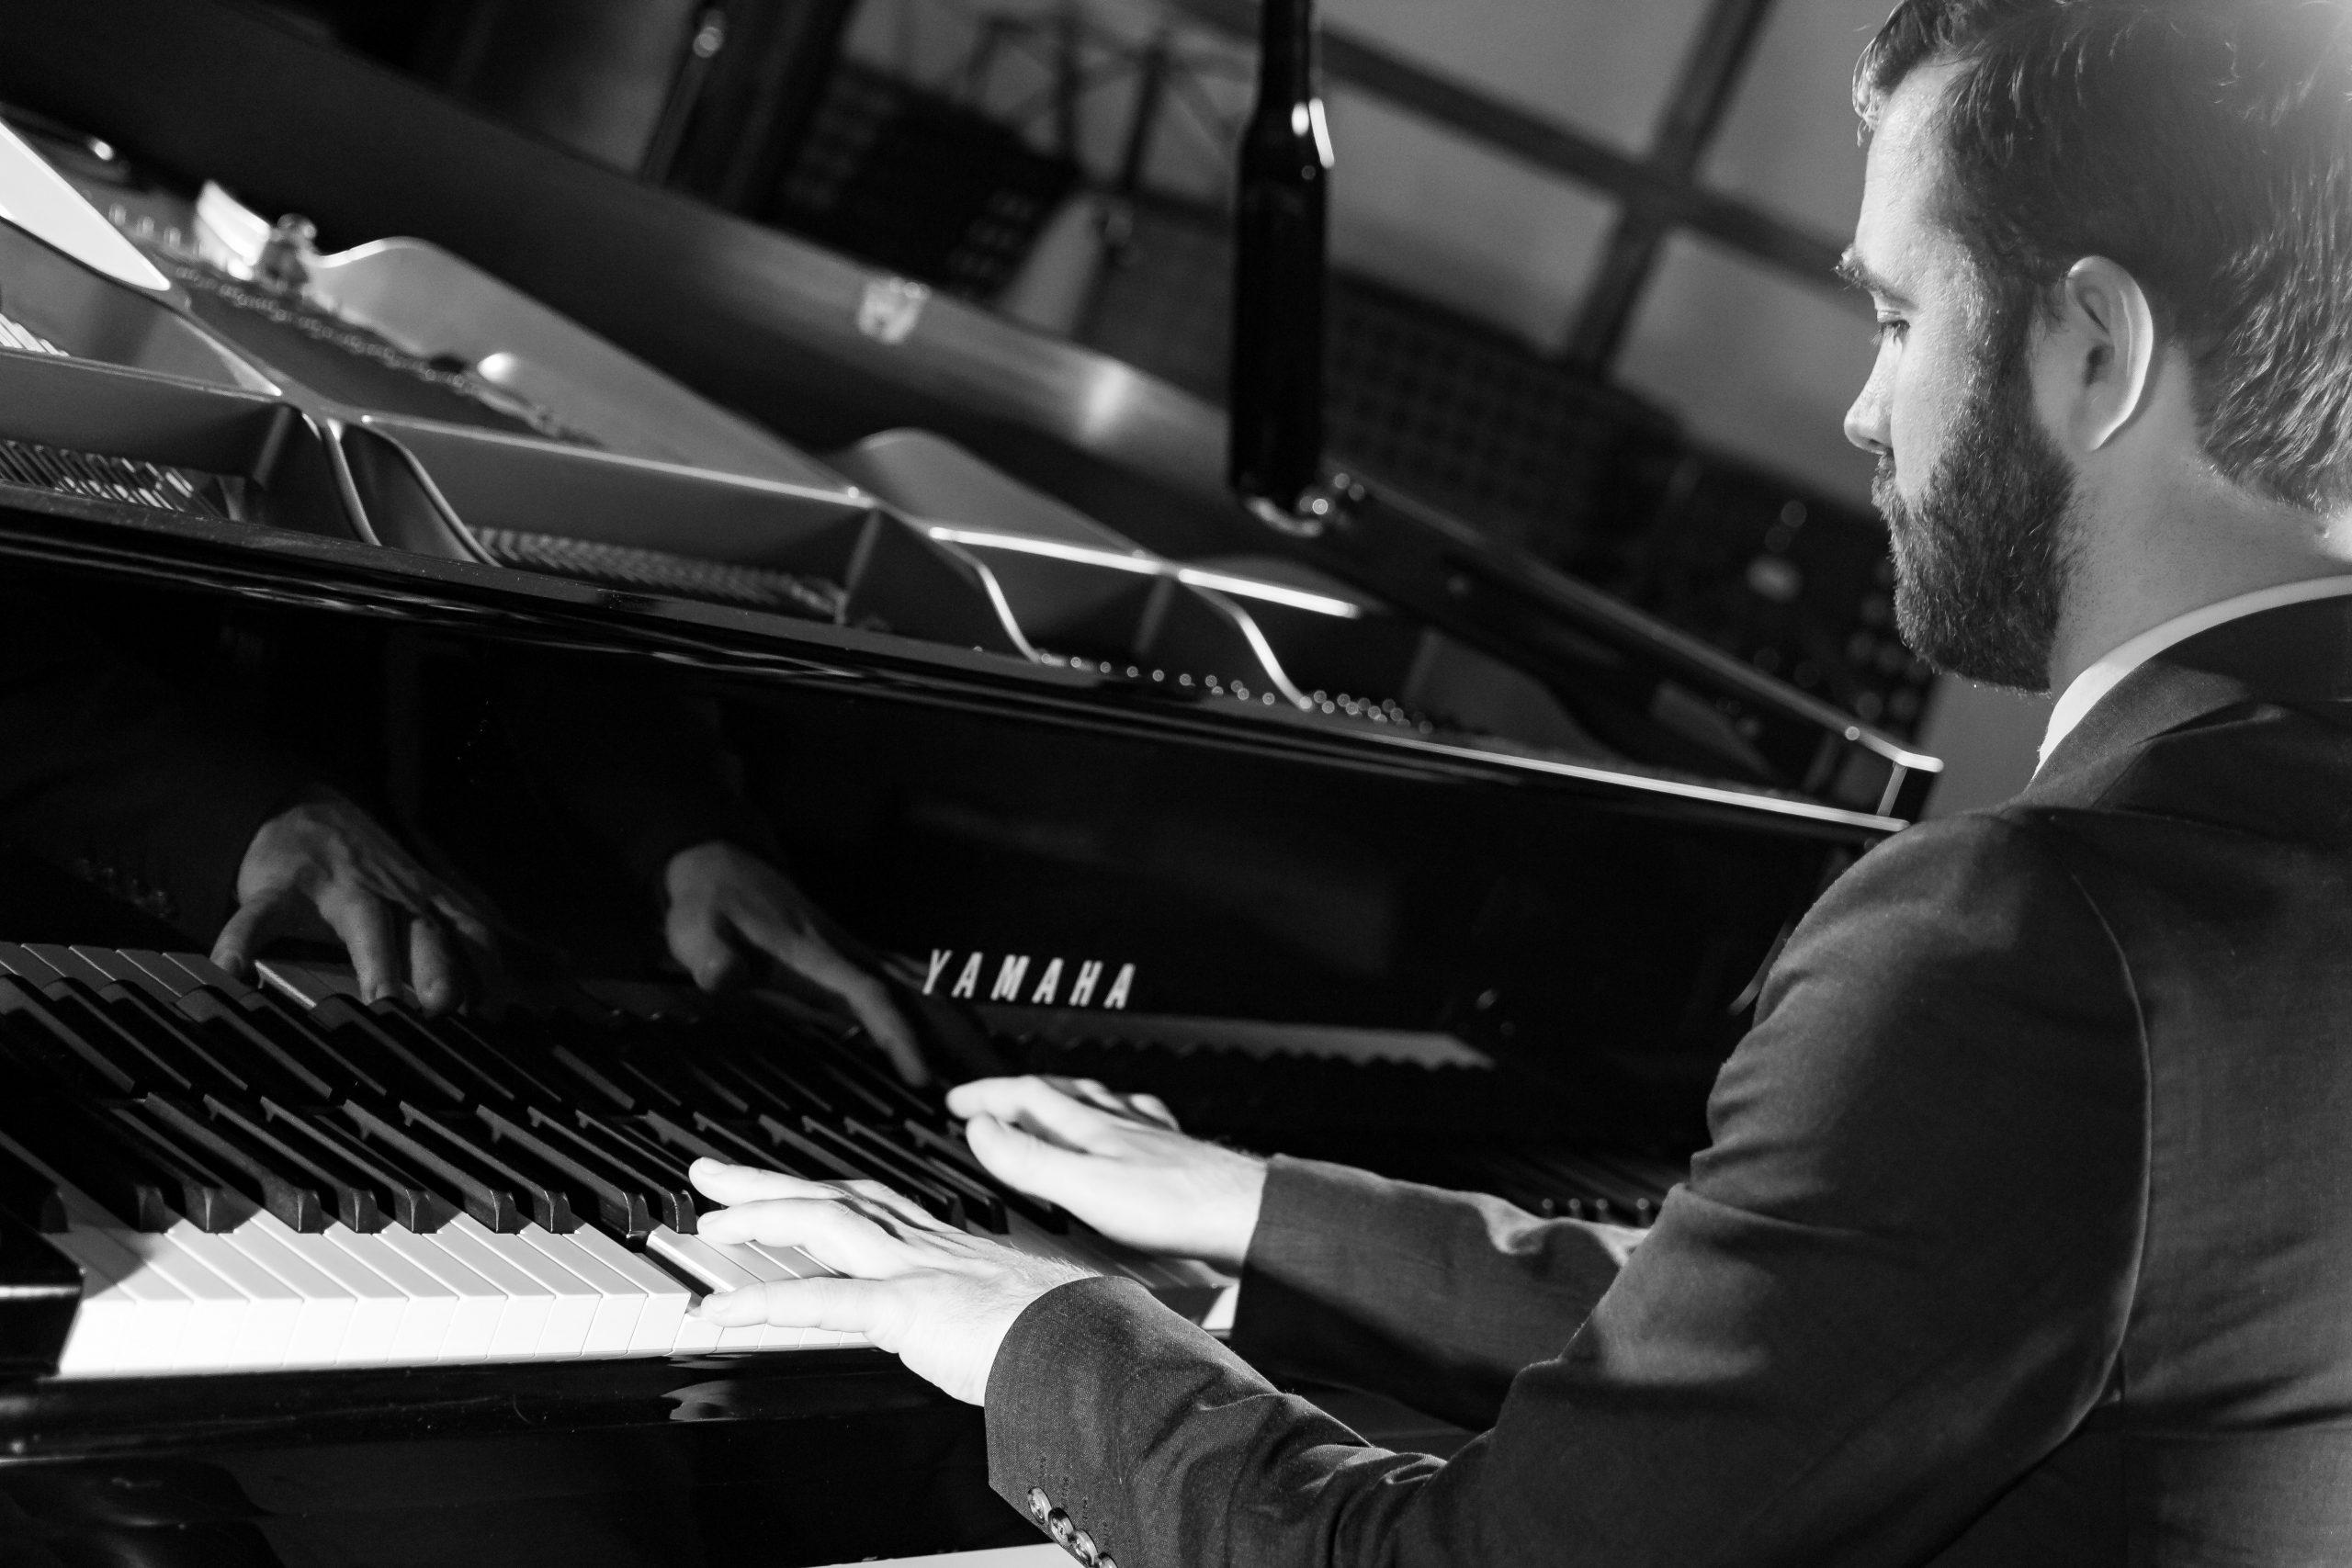 Wedding pianist